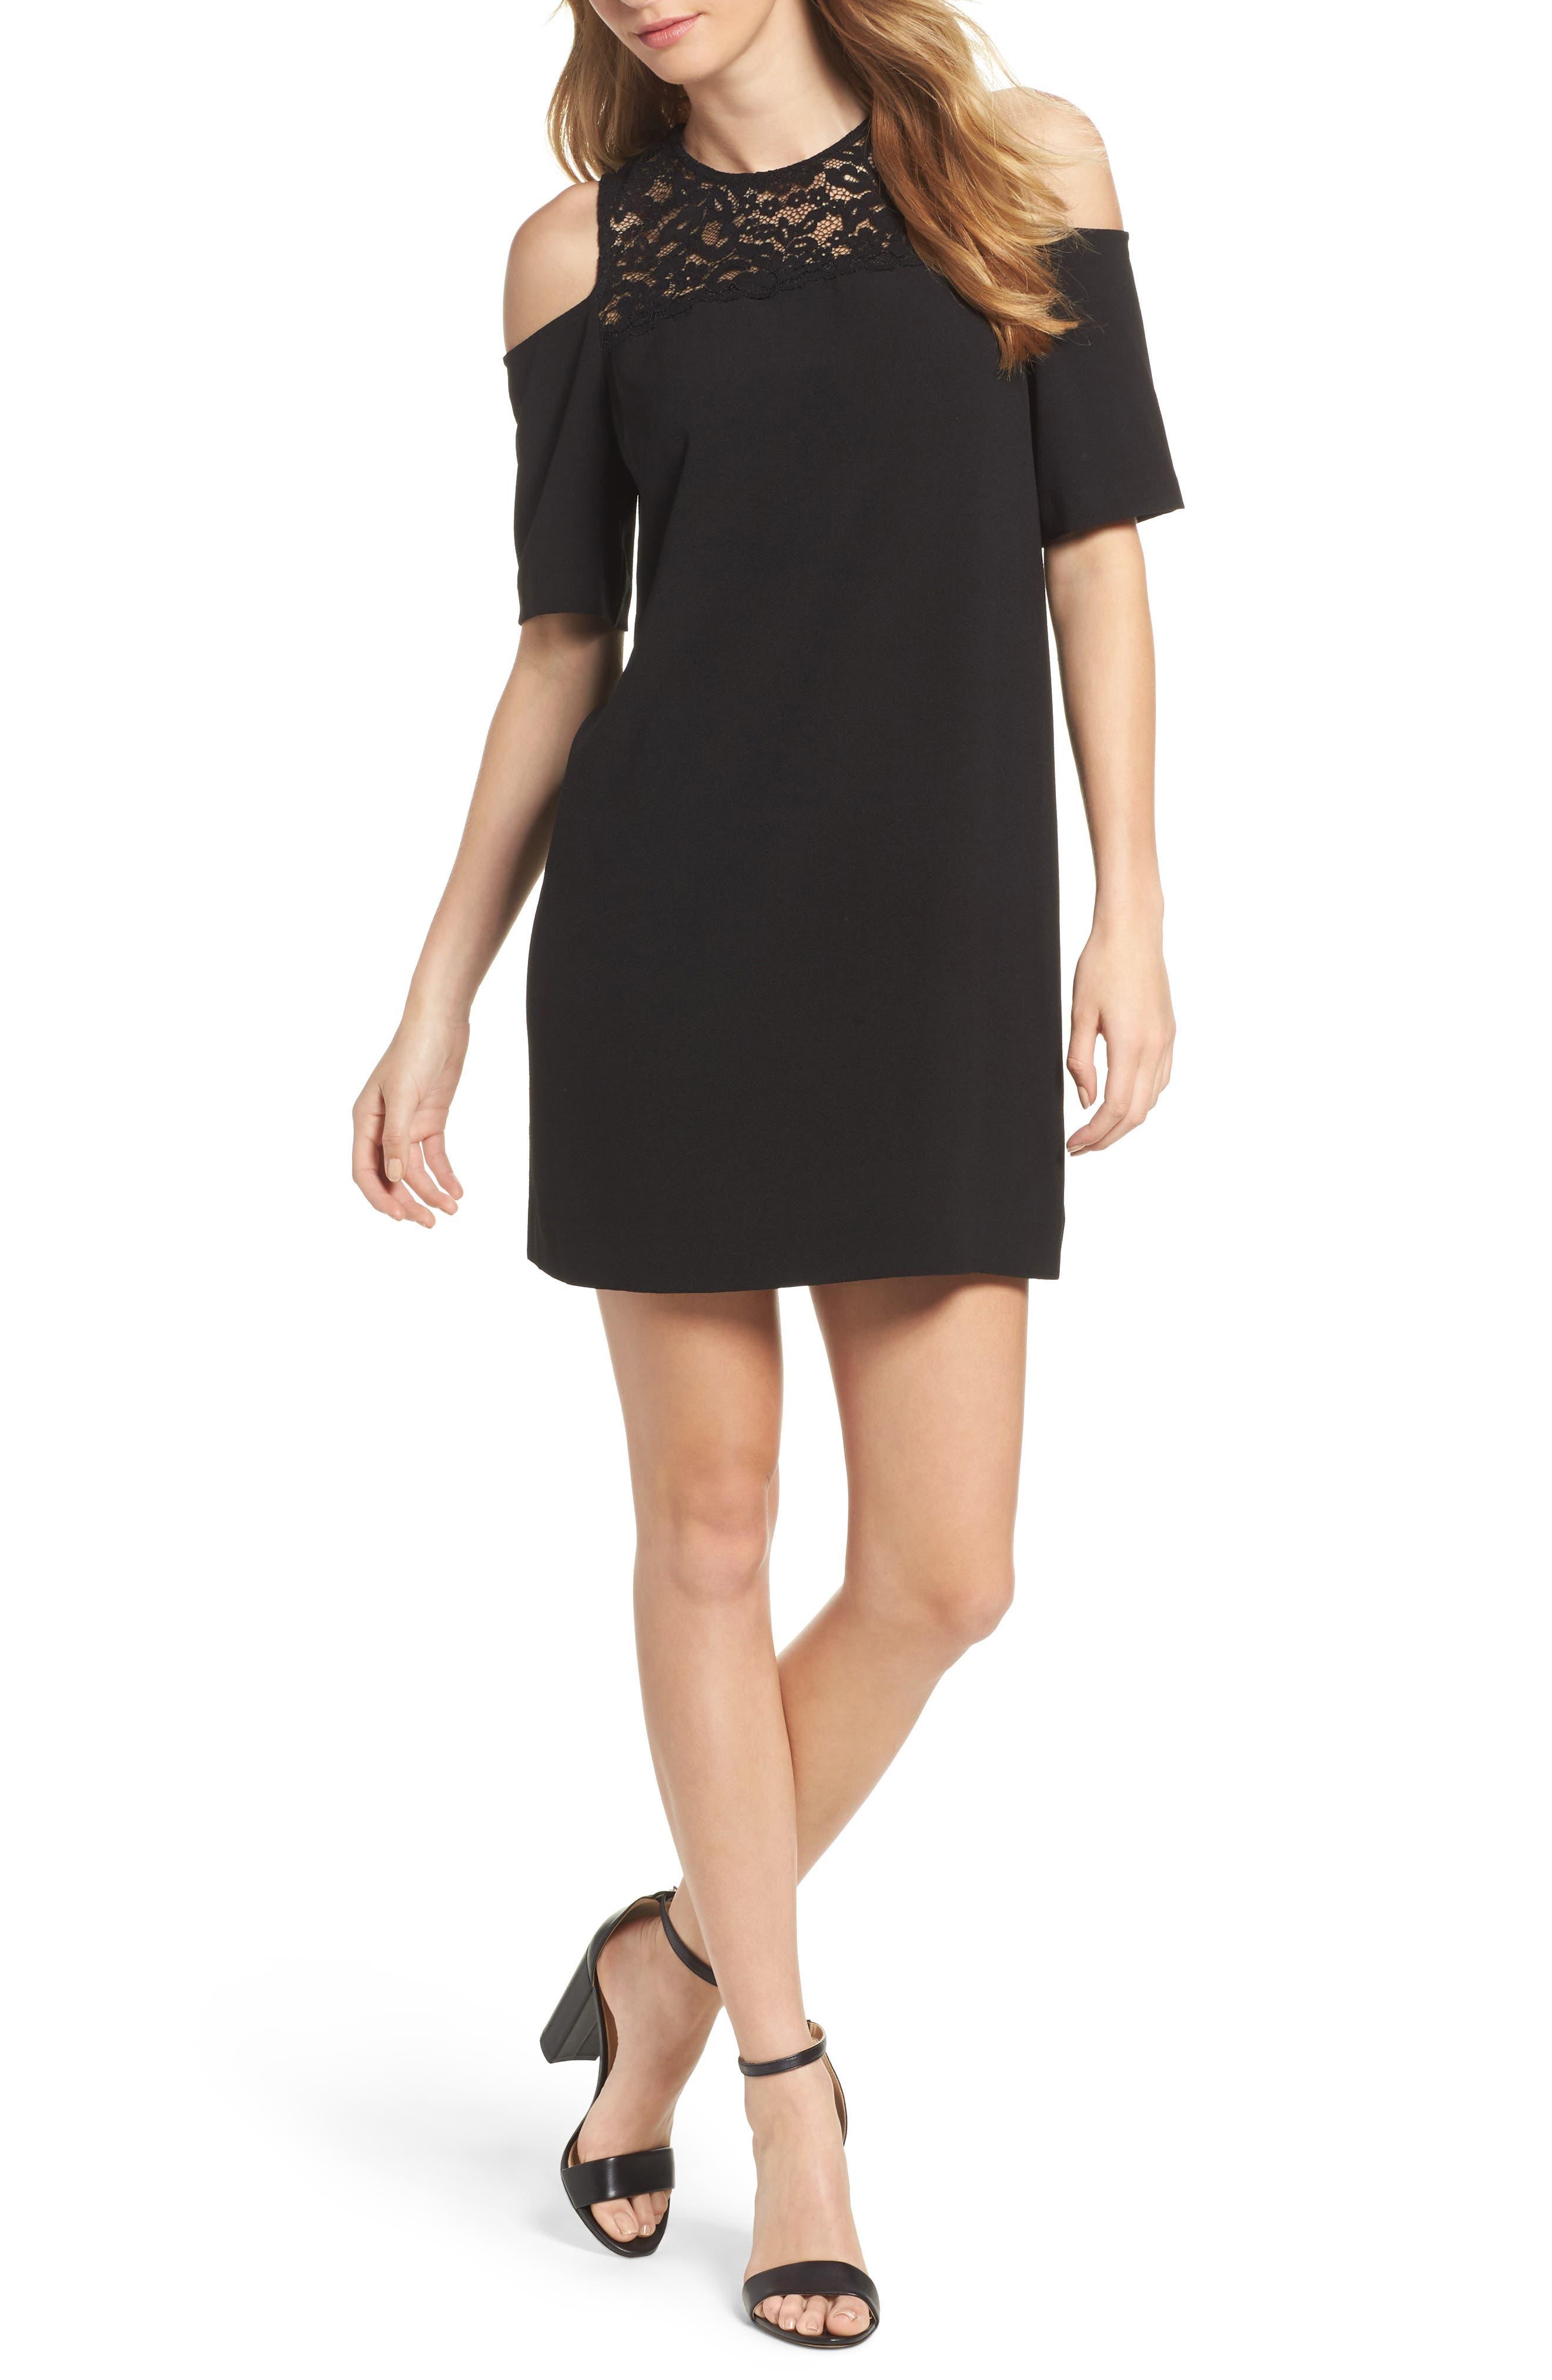 Alternate Image 1 Selected - Felicity & Coco Jess Cold Shoulder Lace Dress